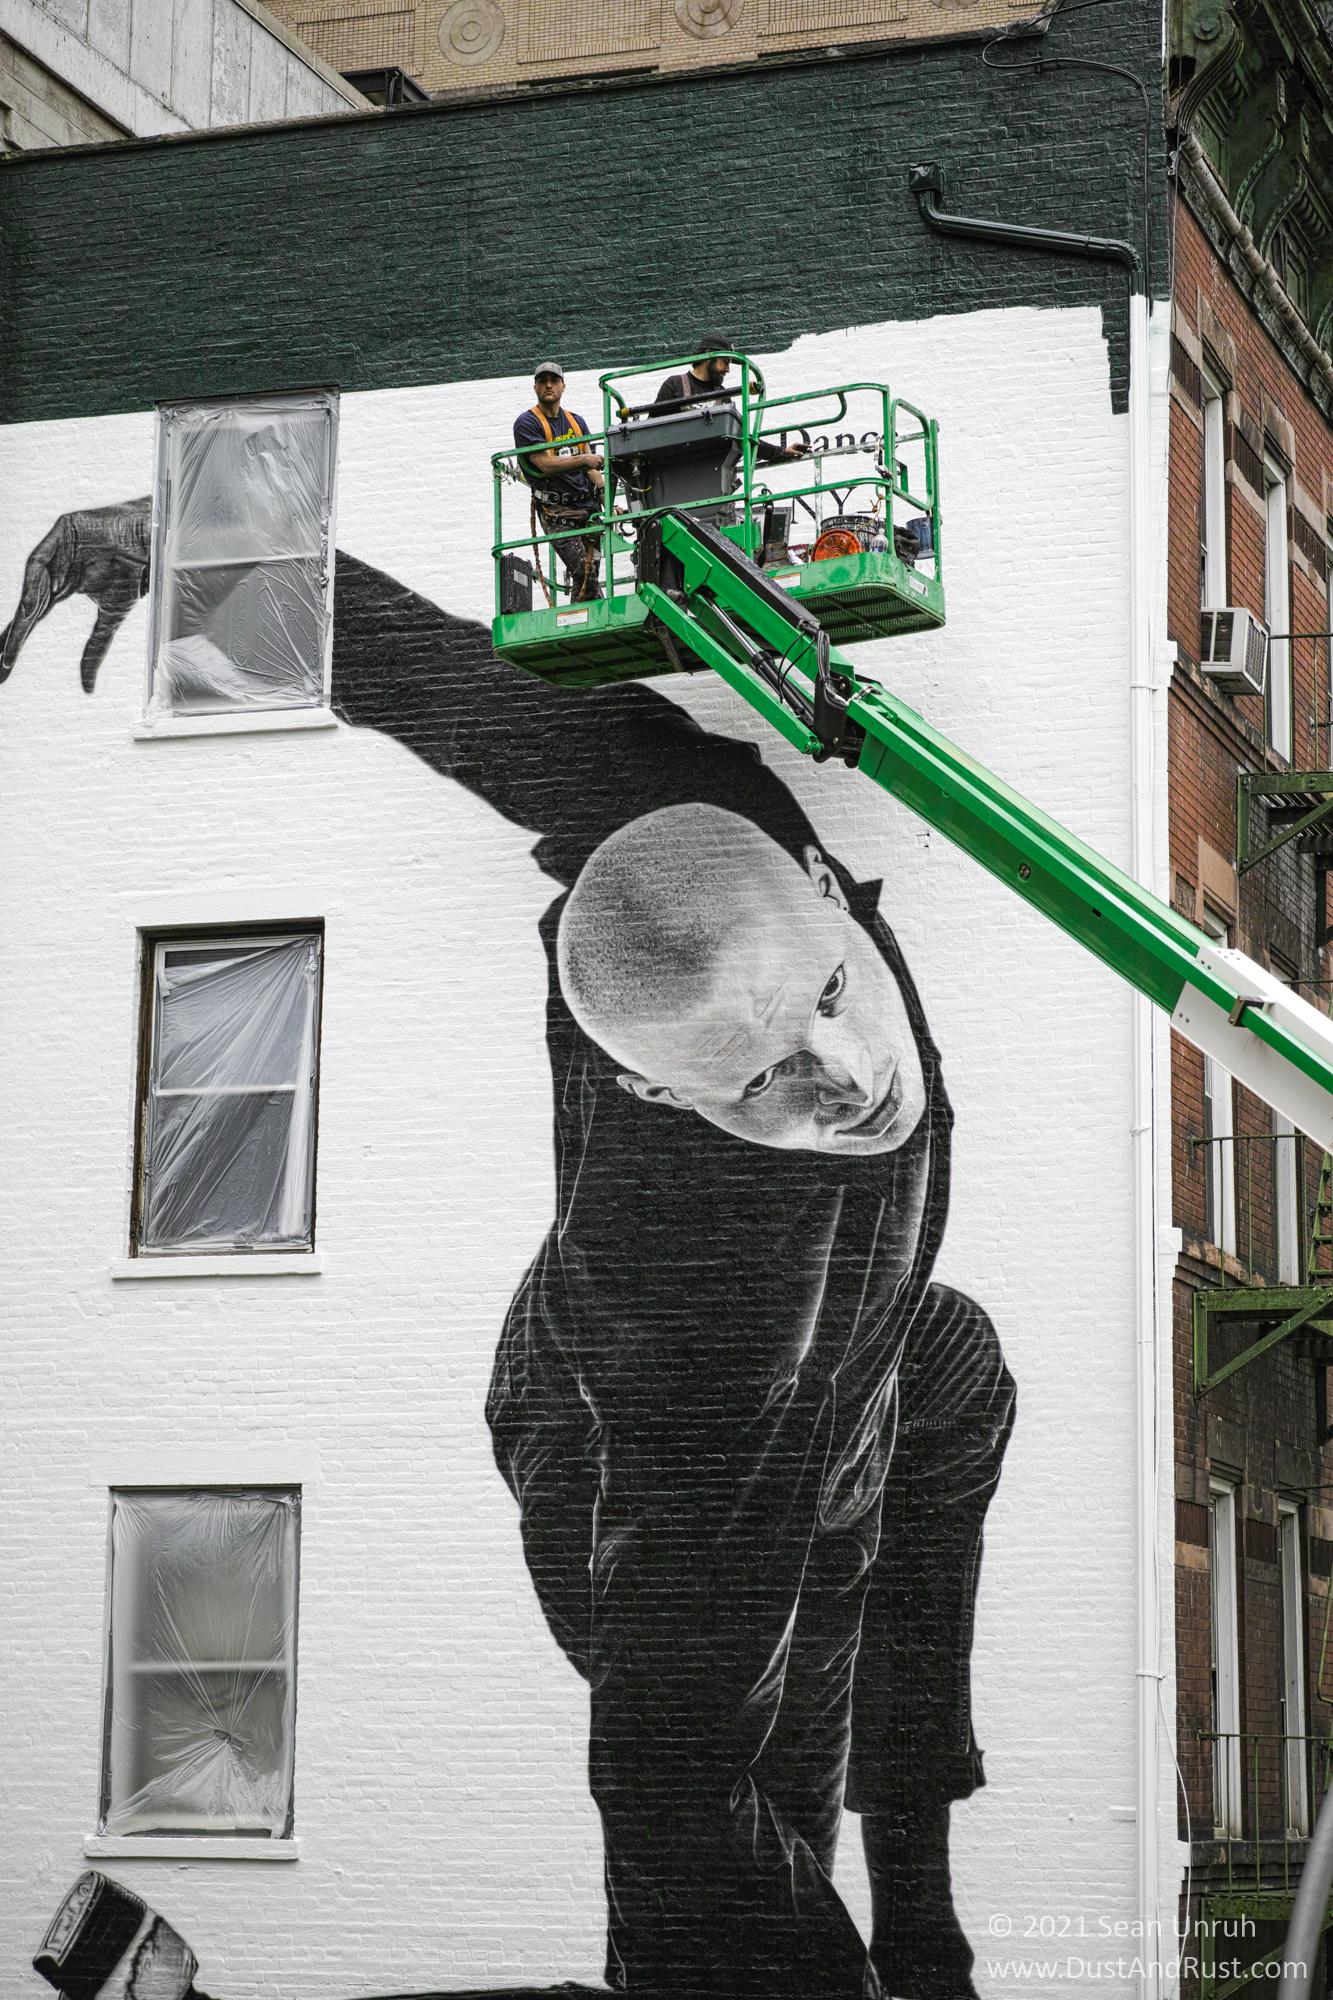 NYC Mural